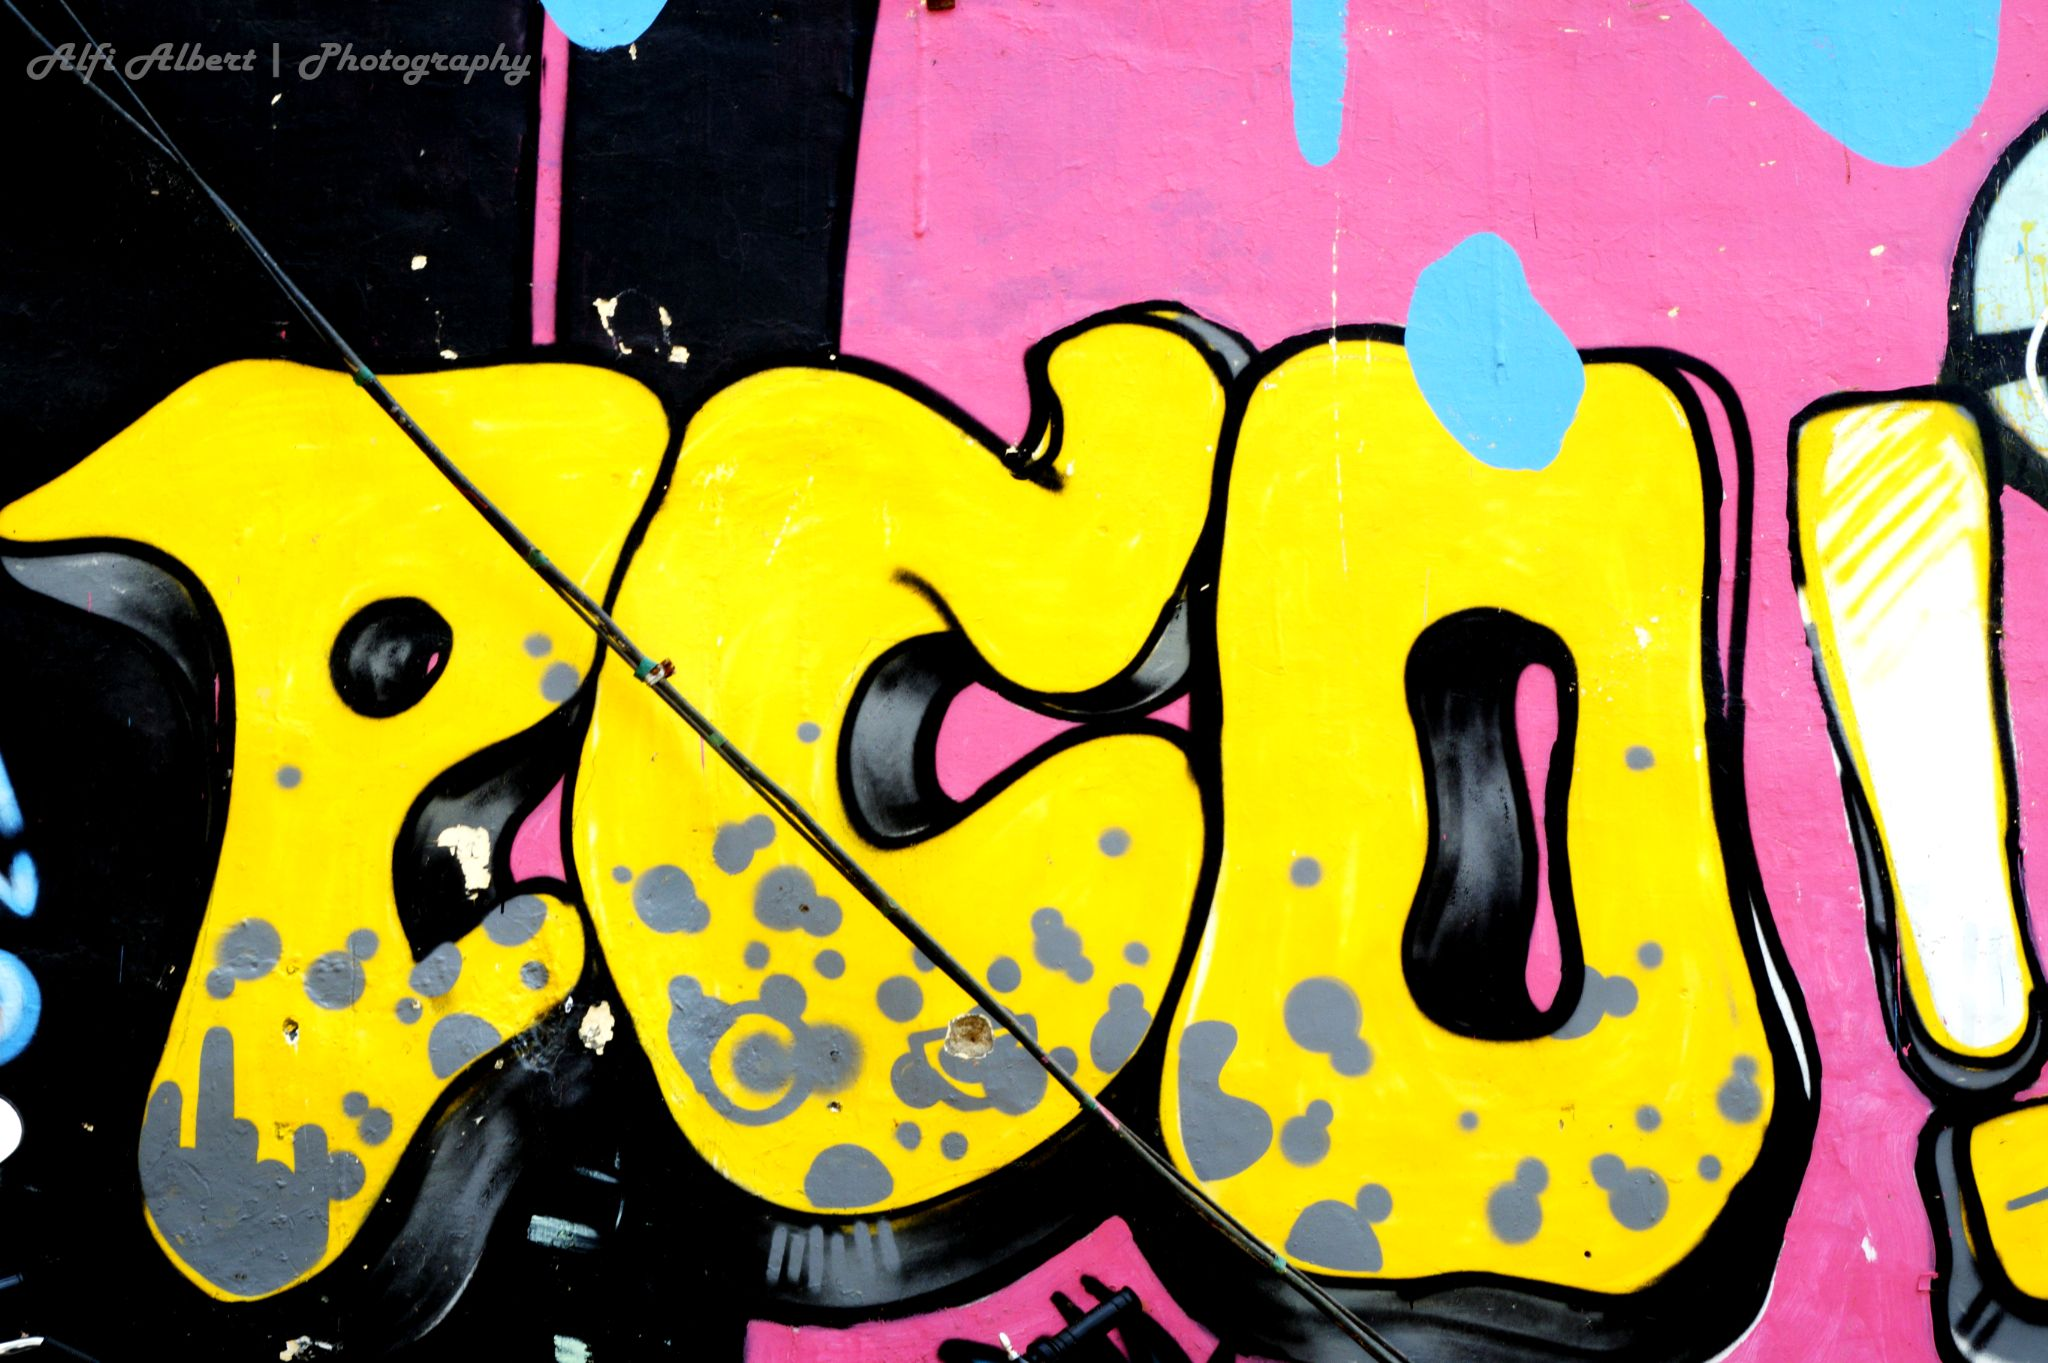 Graffiti by Alfi Albert Photography